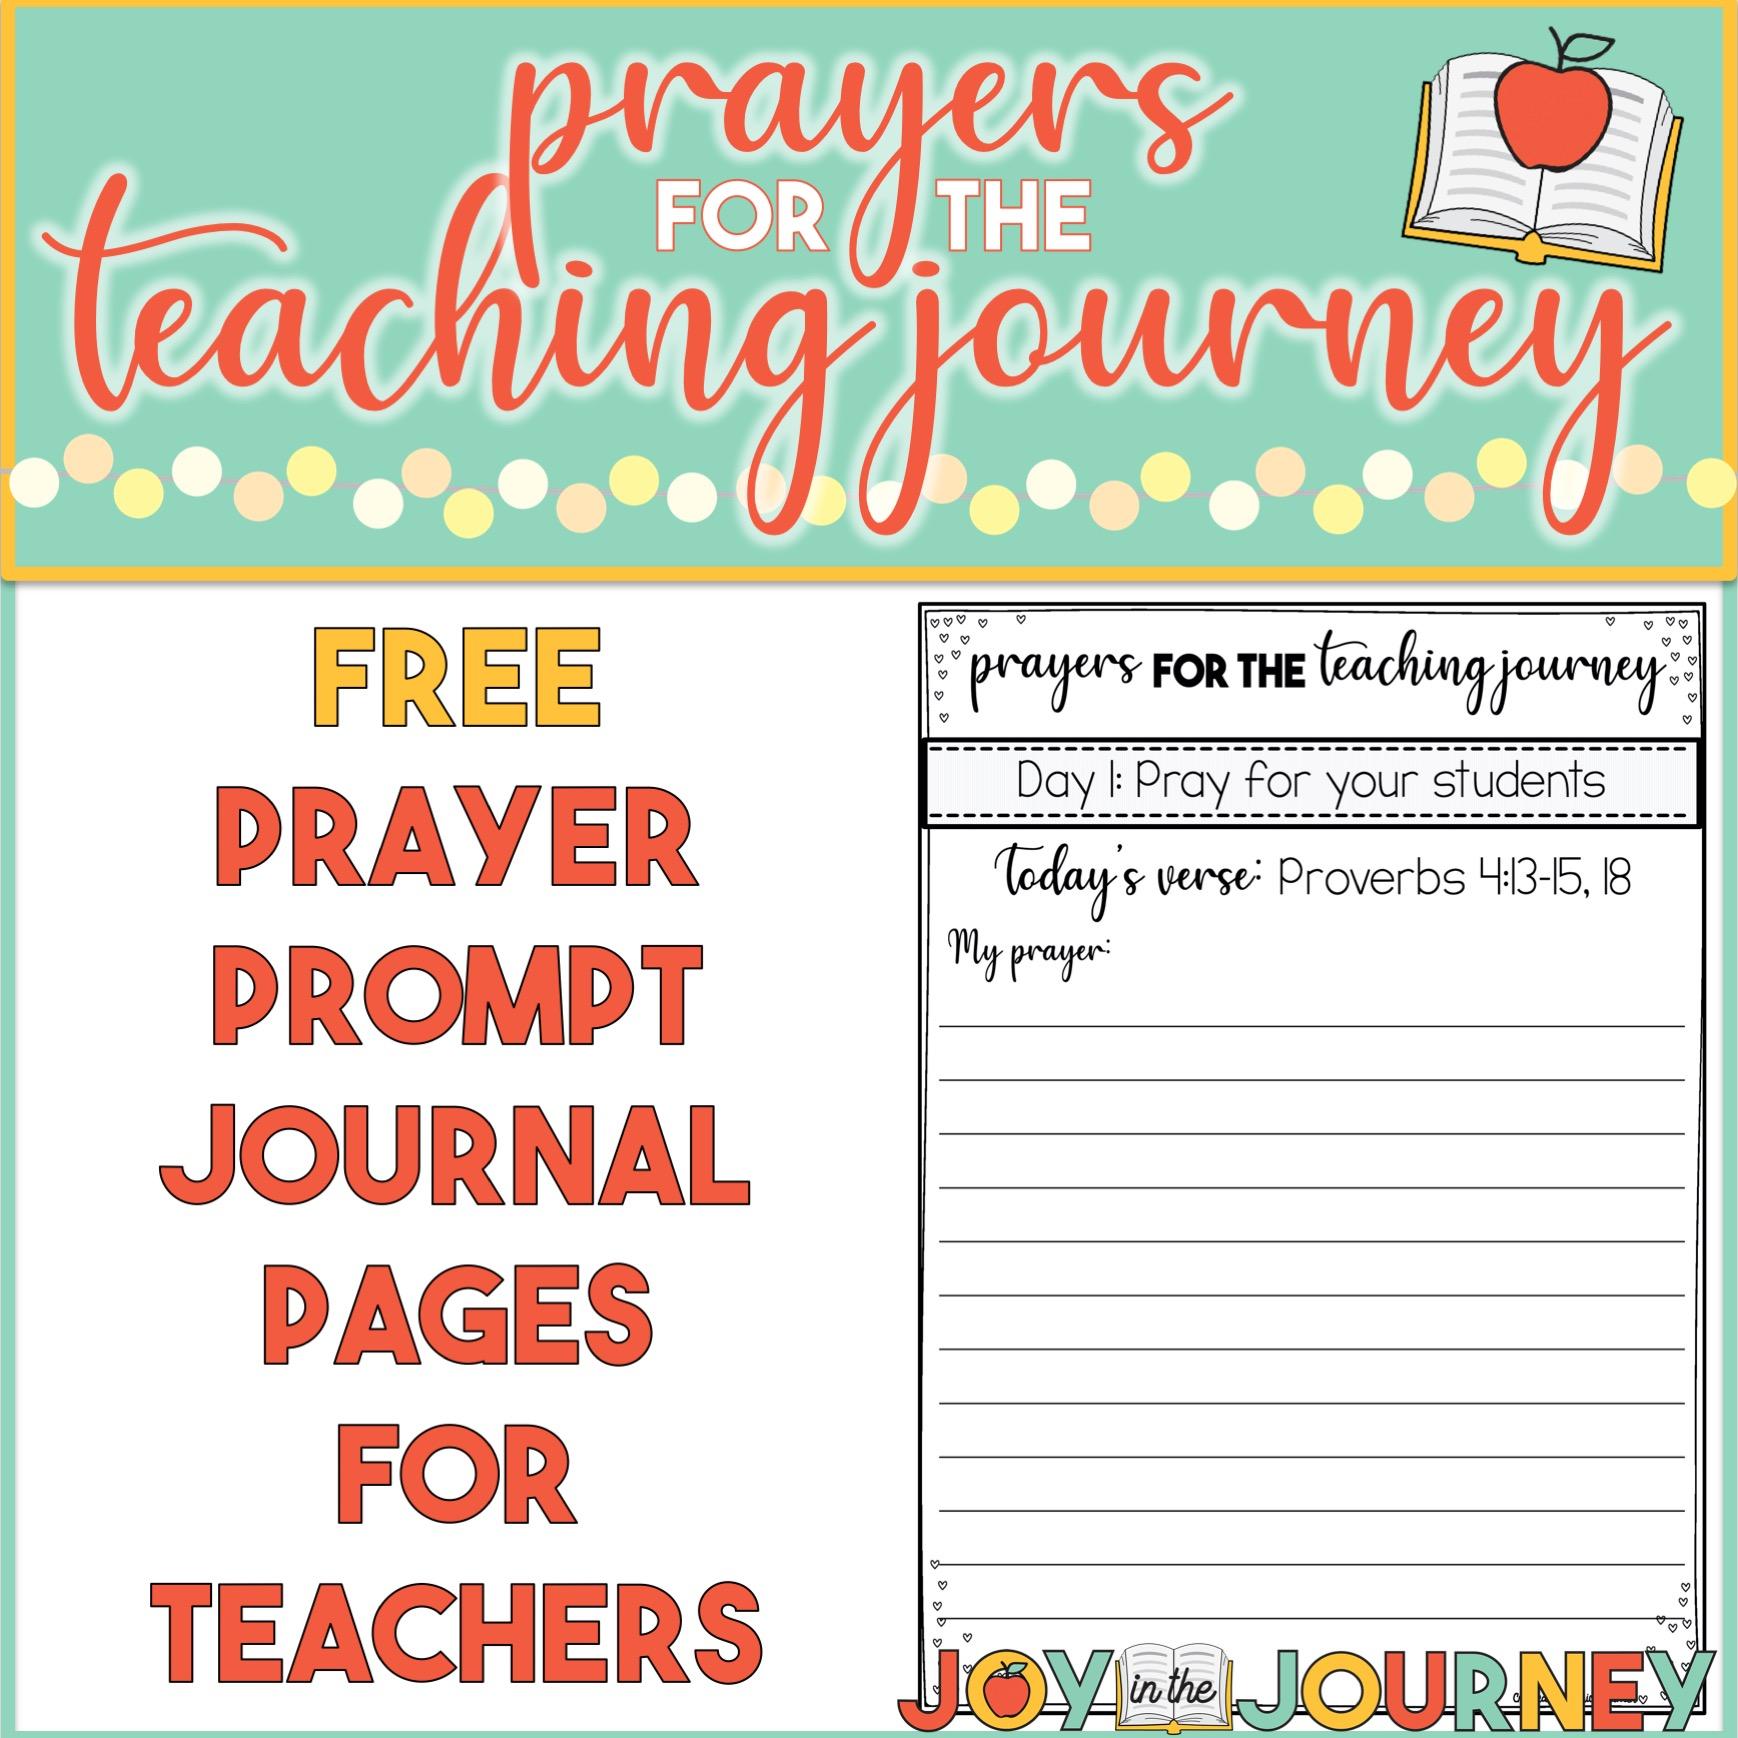 Free Prayer Prompts for Teachers